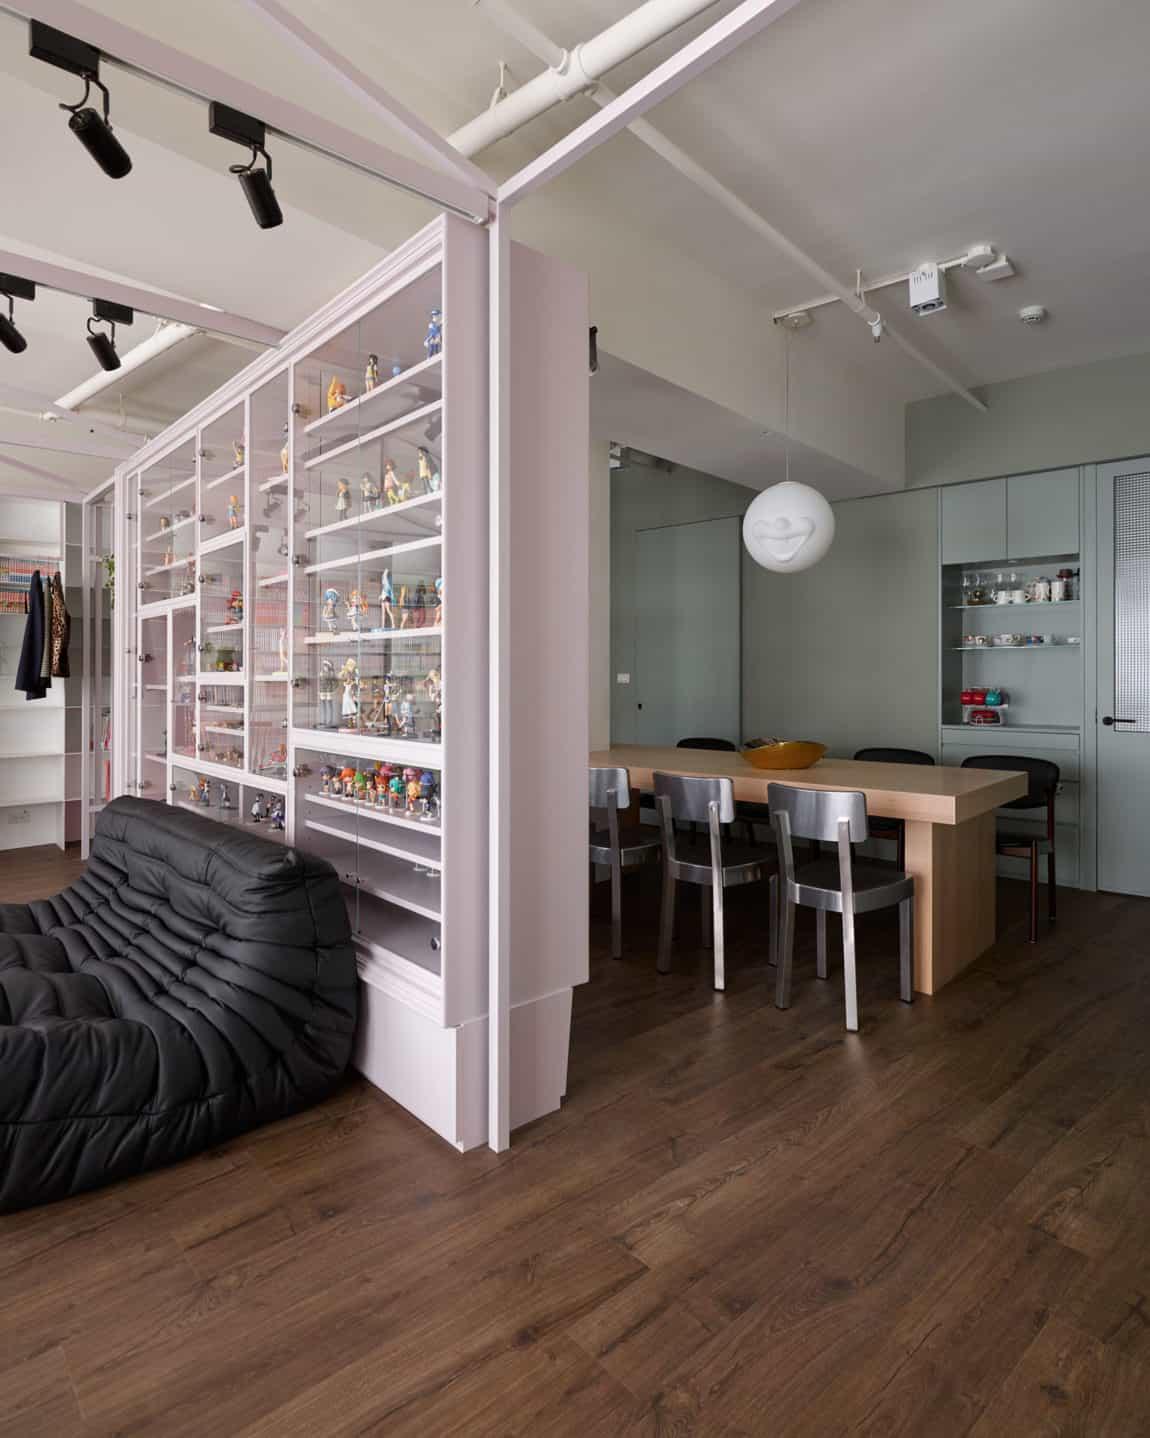 In House by Ganna design (5)